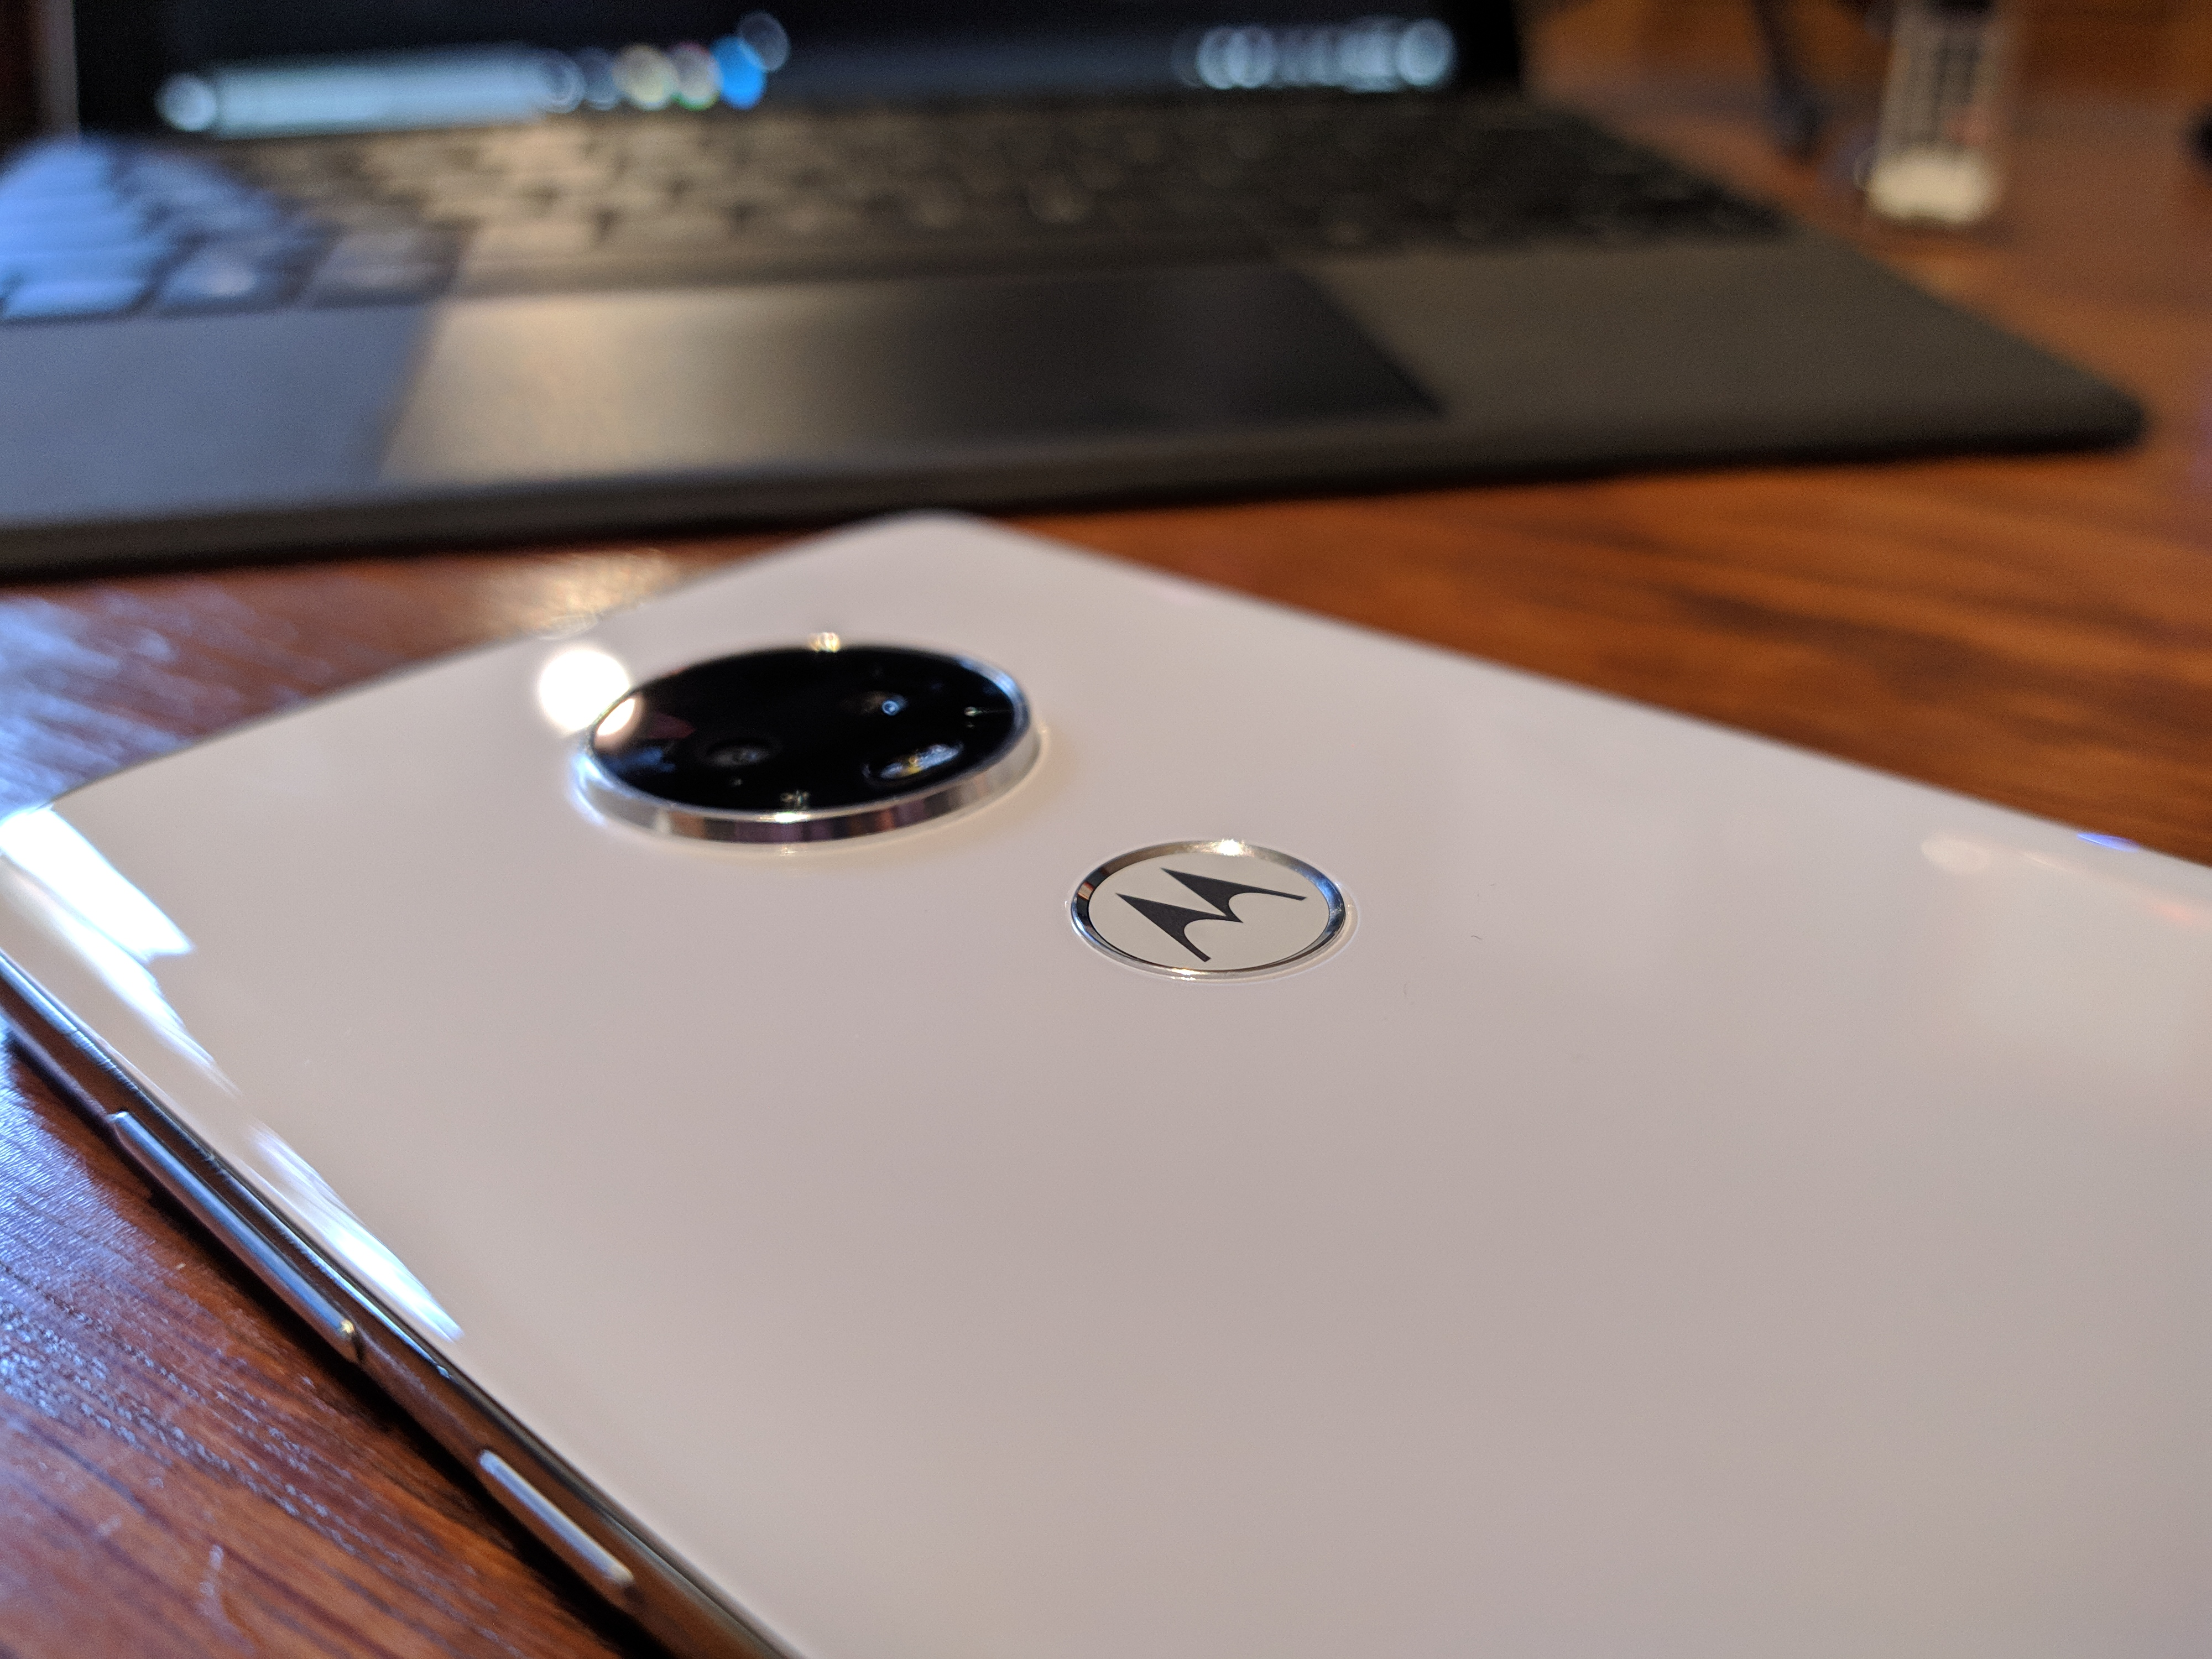 Moto G7 Finger Printer Scanner and Camera